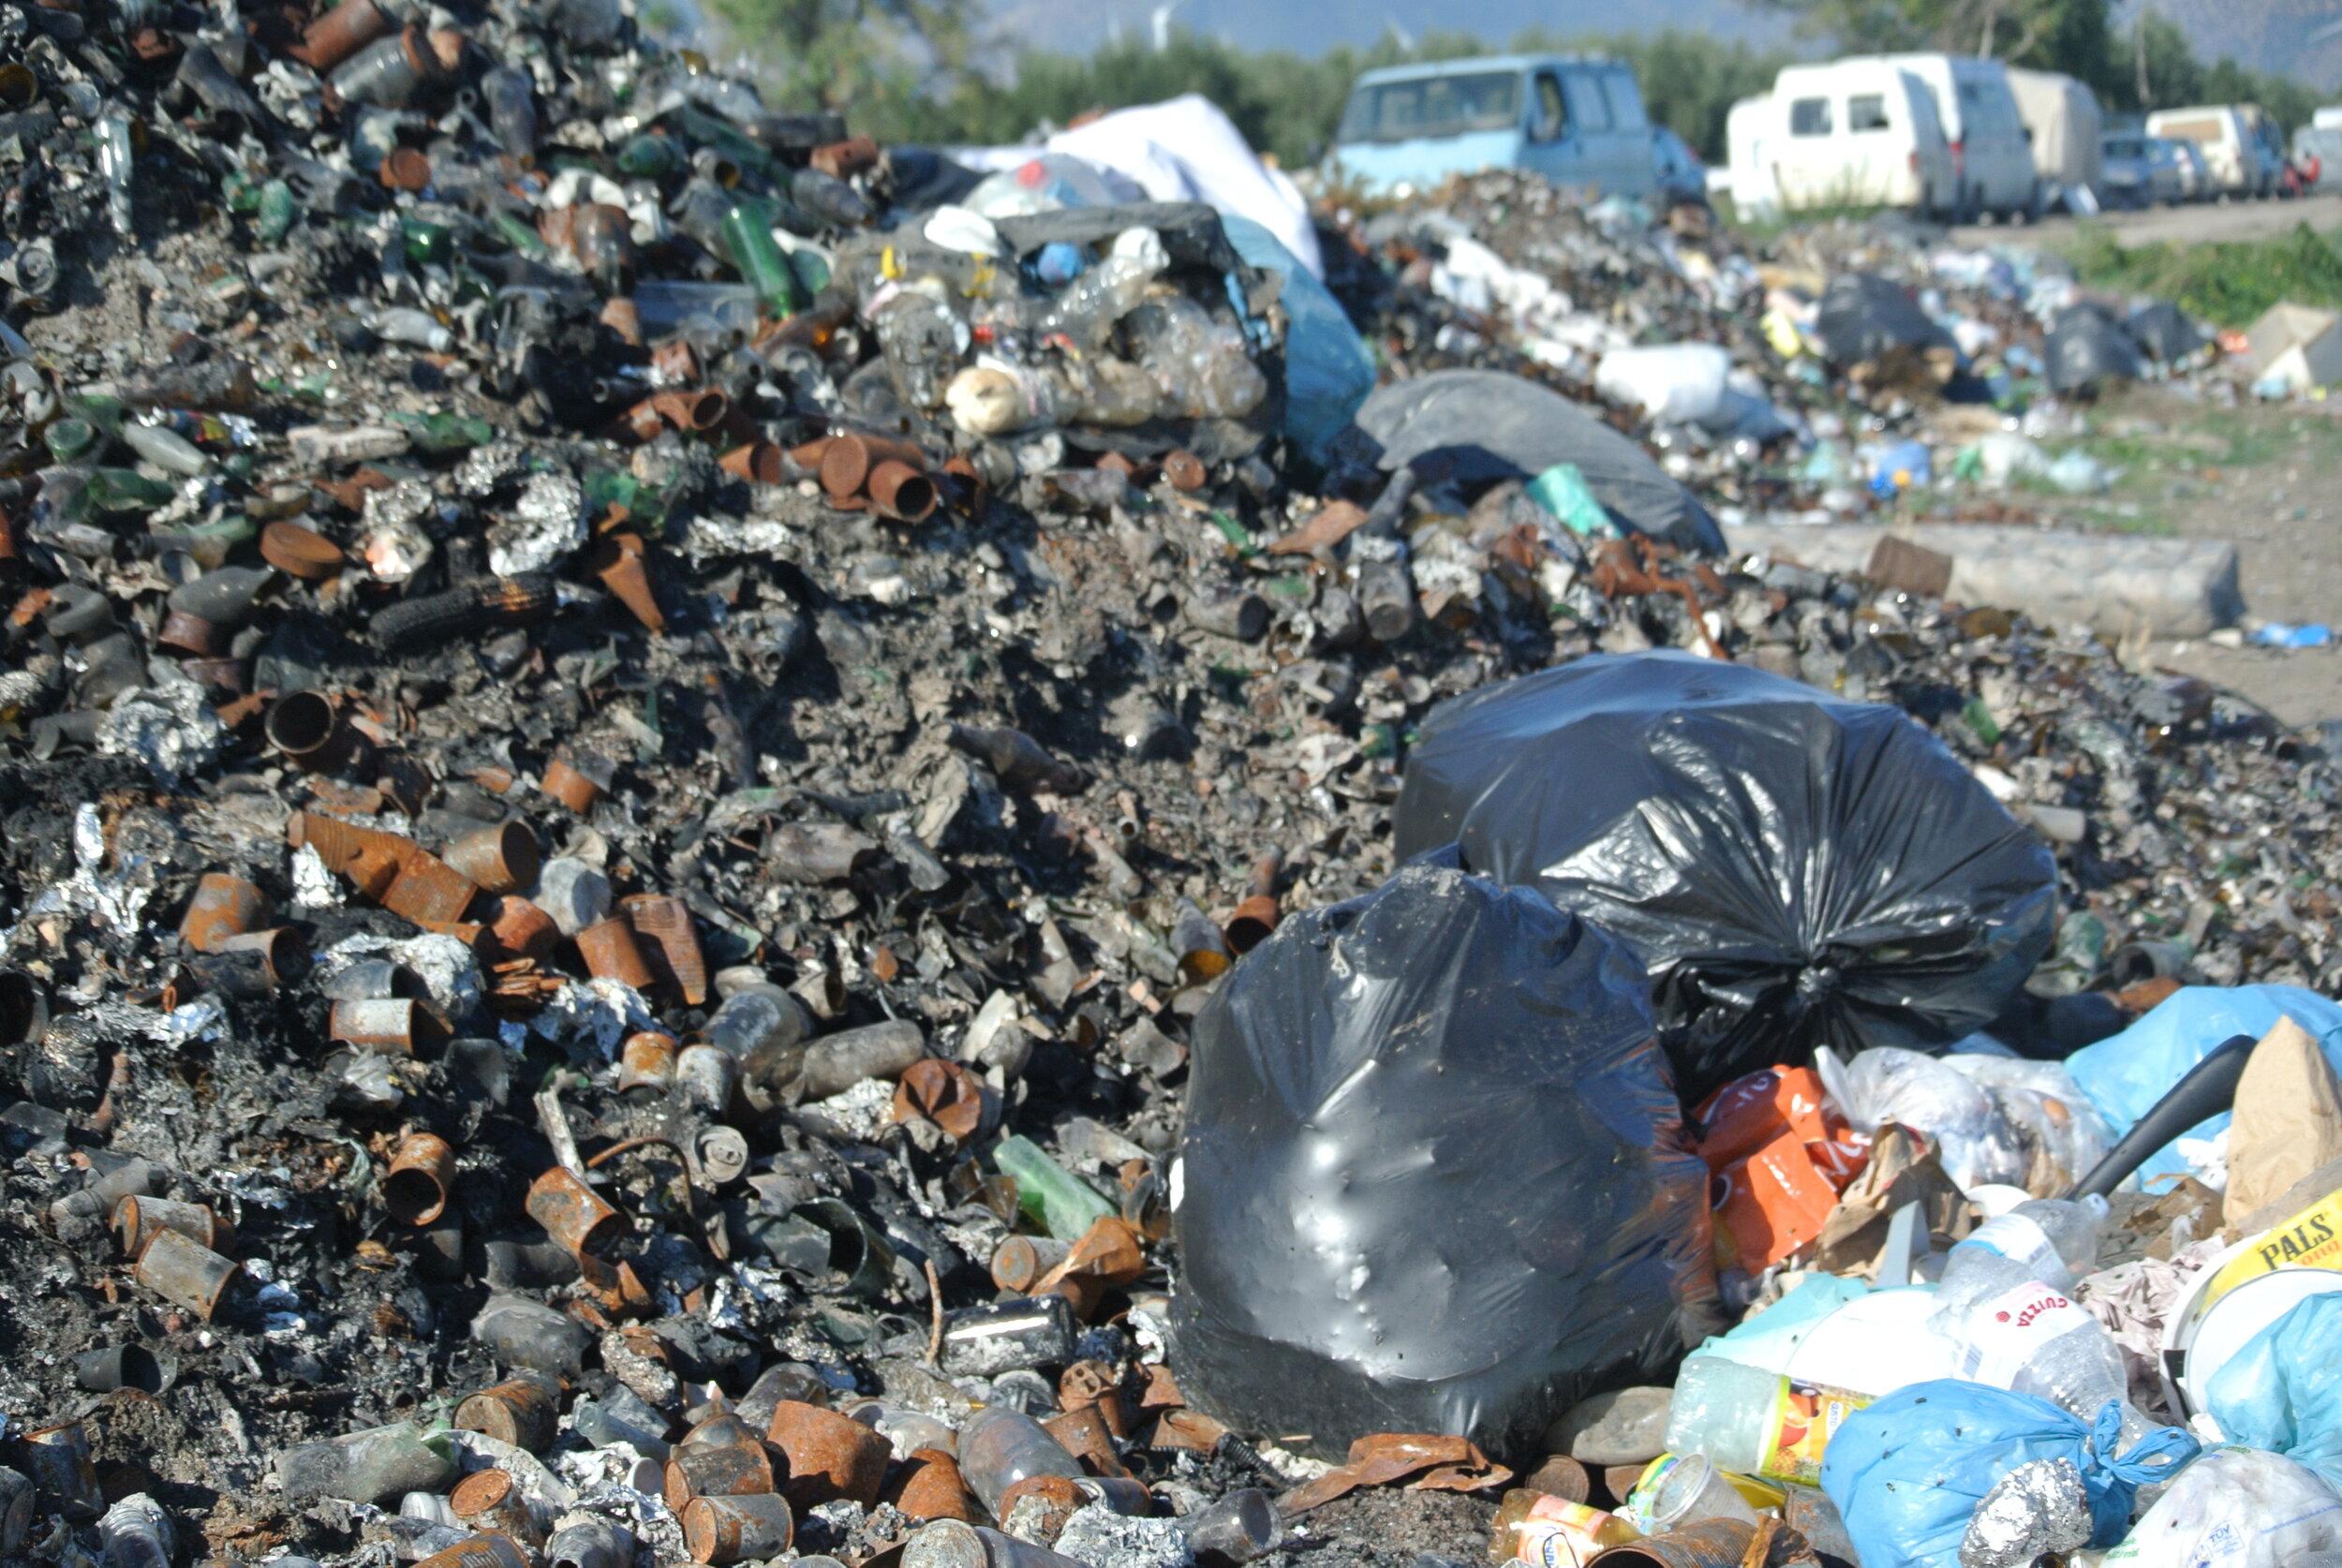 The trash upclose. Foggia, Italy. 8 October 2019. ©Pamela Kerpius